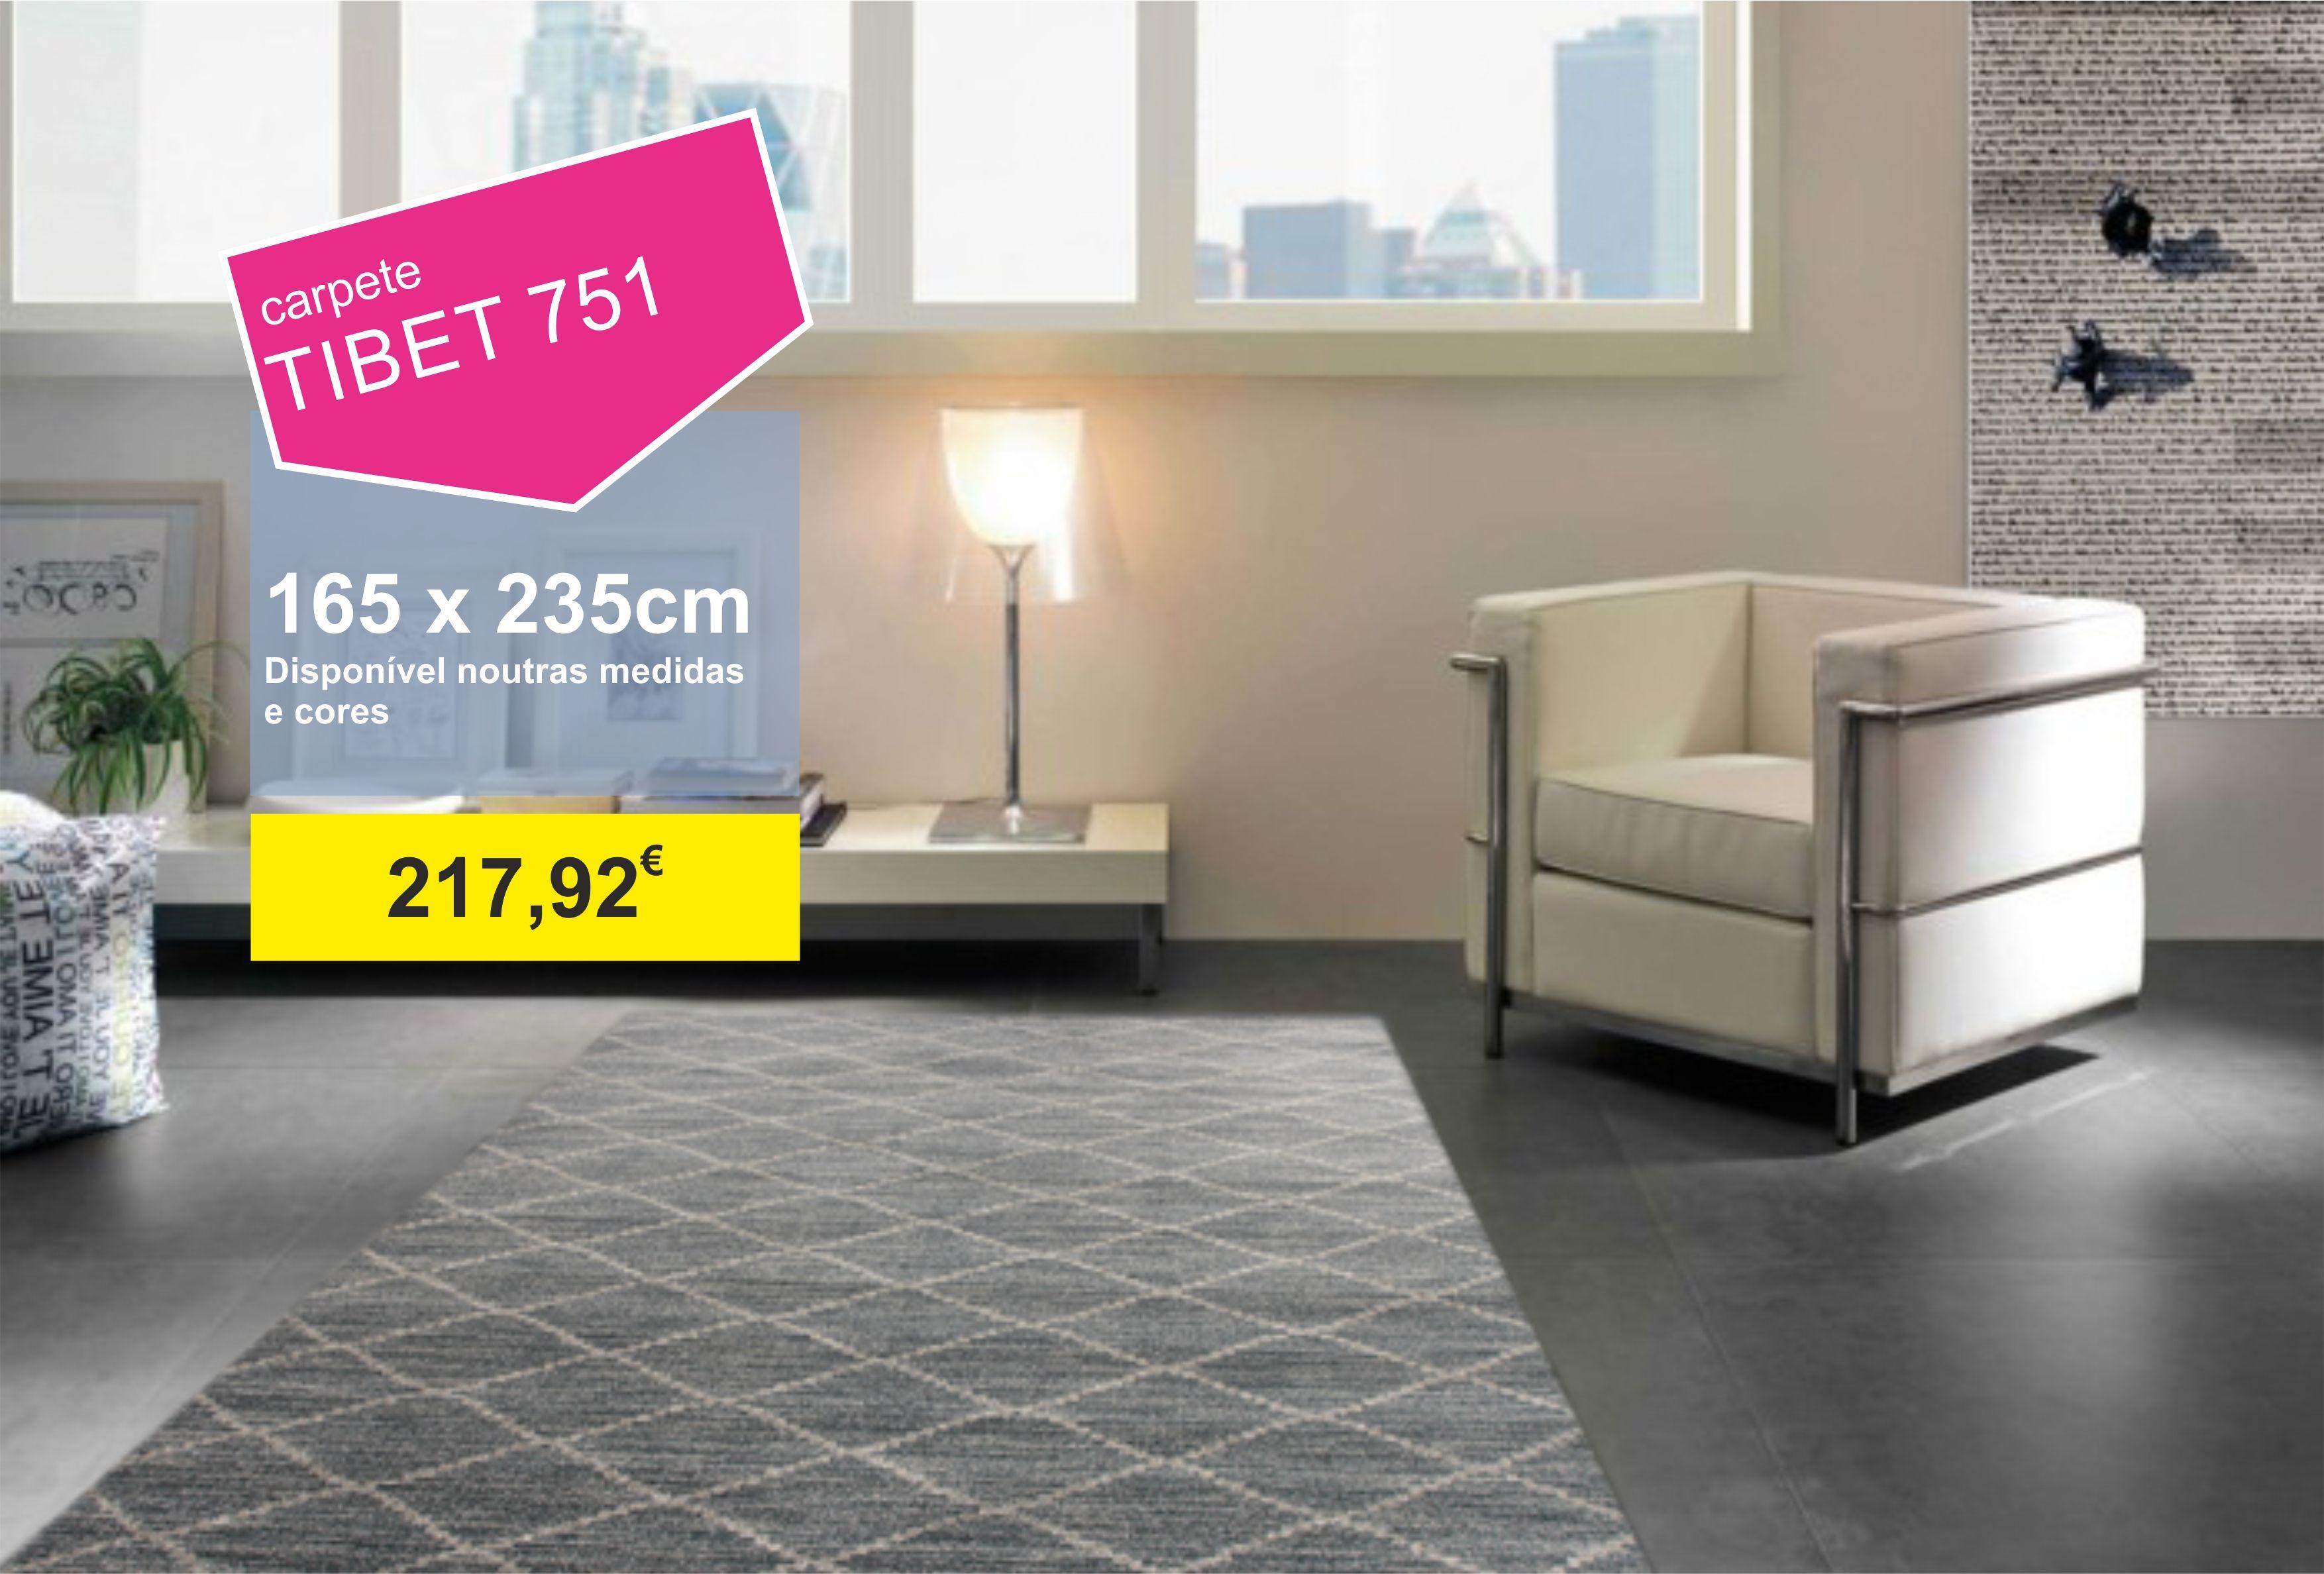 Carpete De Estilo Simples E Moderno Disponivel Noutras Cores E Tamanhos Carpete Tapete Tapetes Carpetes Carpetesala Metroquadra Carpete Decoracao Cores